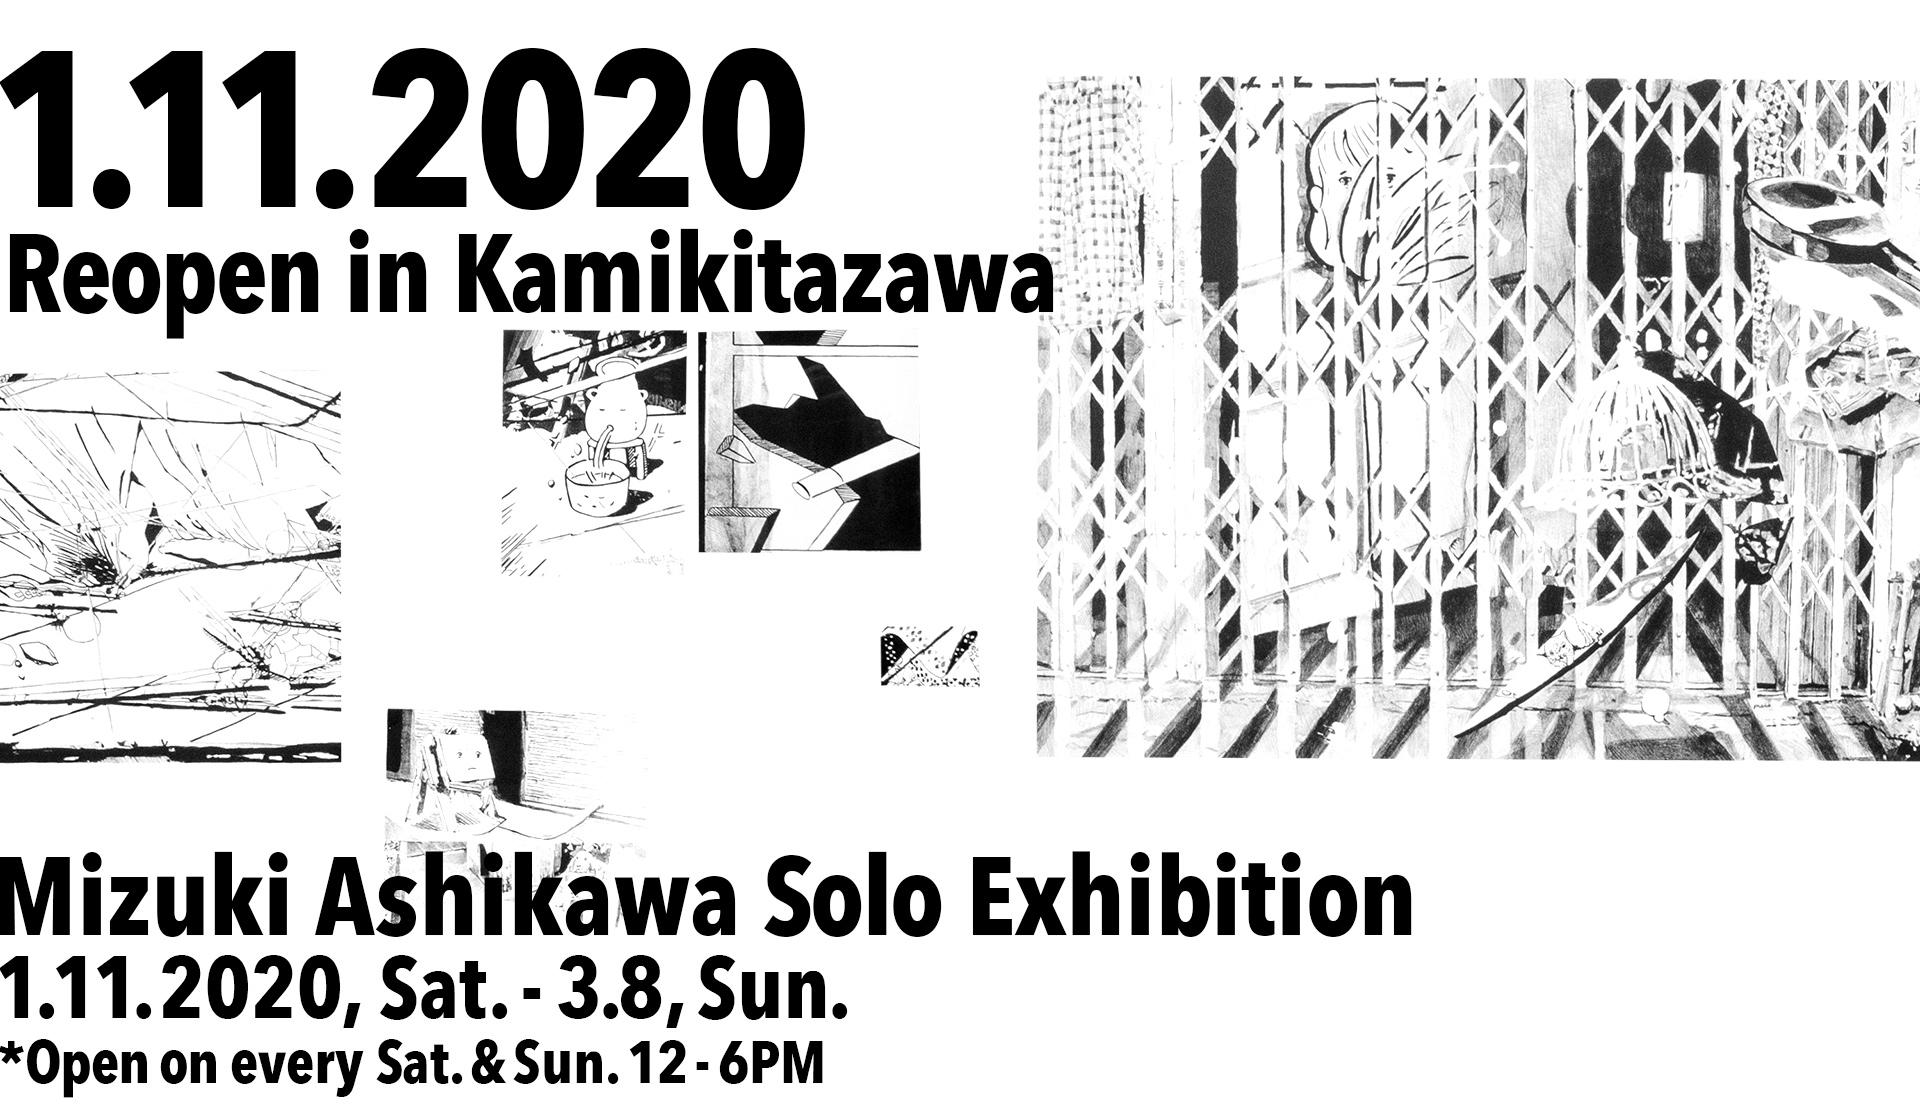 1.11.2020 Reopen in Kamikitazawa Mizuki Ashikawa Solo Exhibition